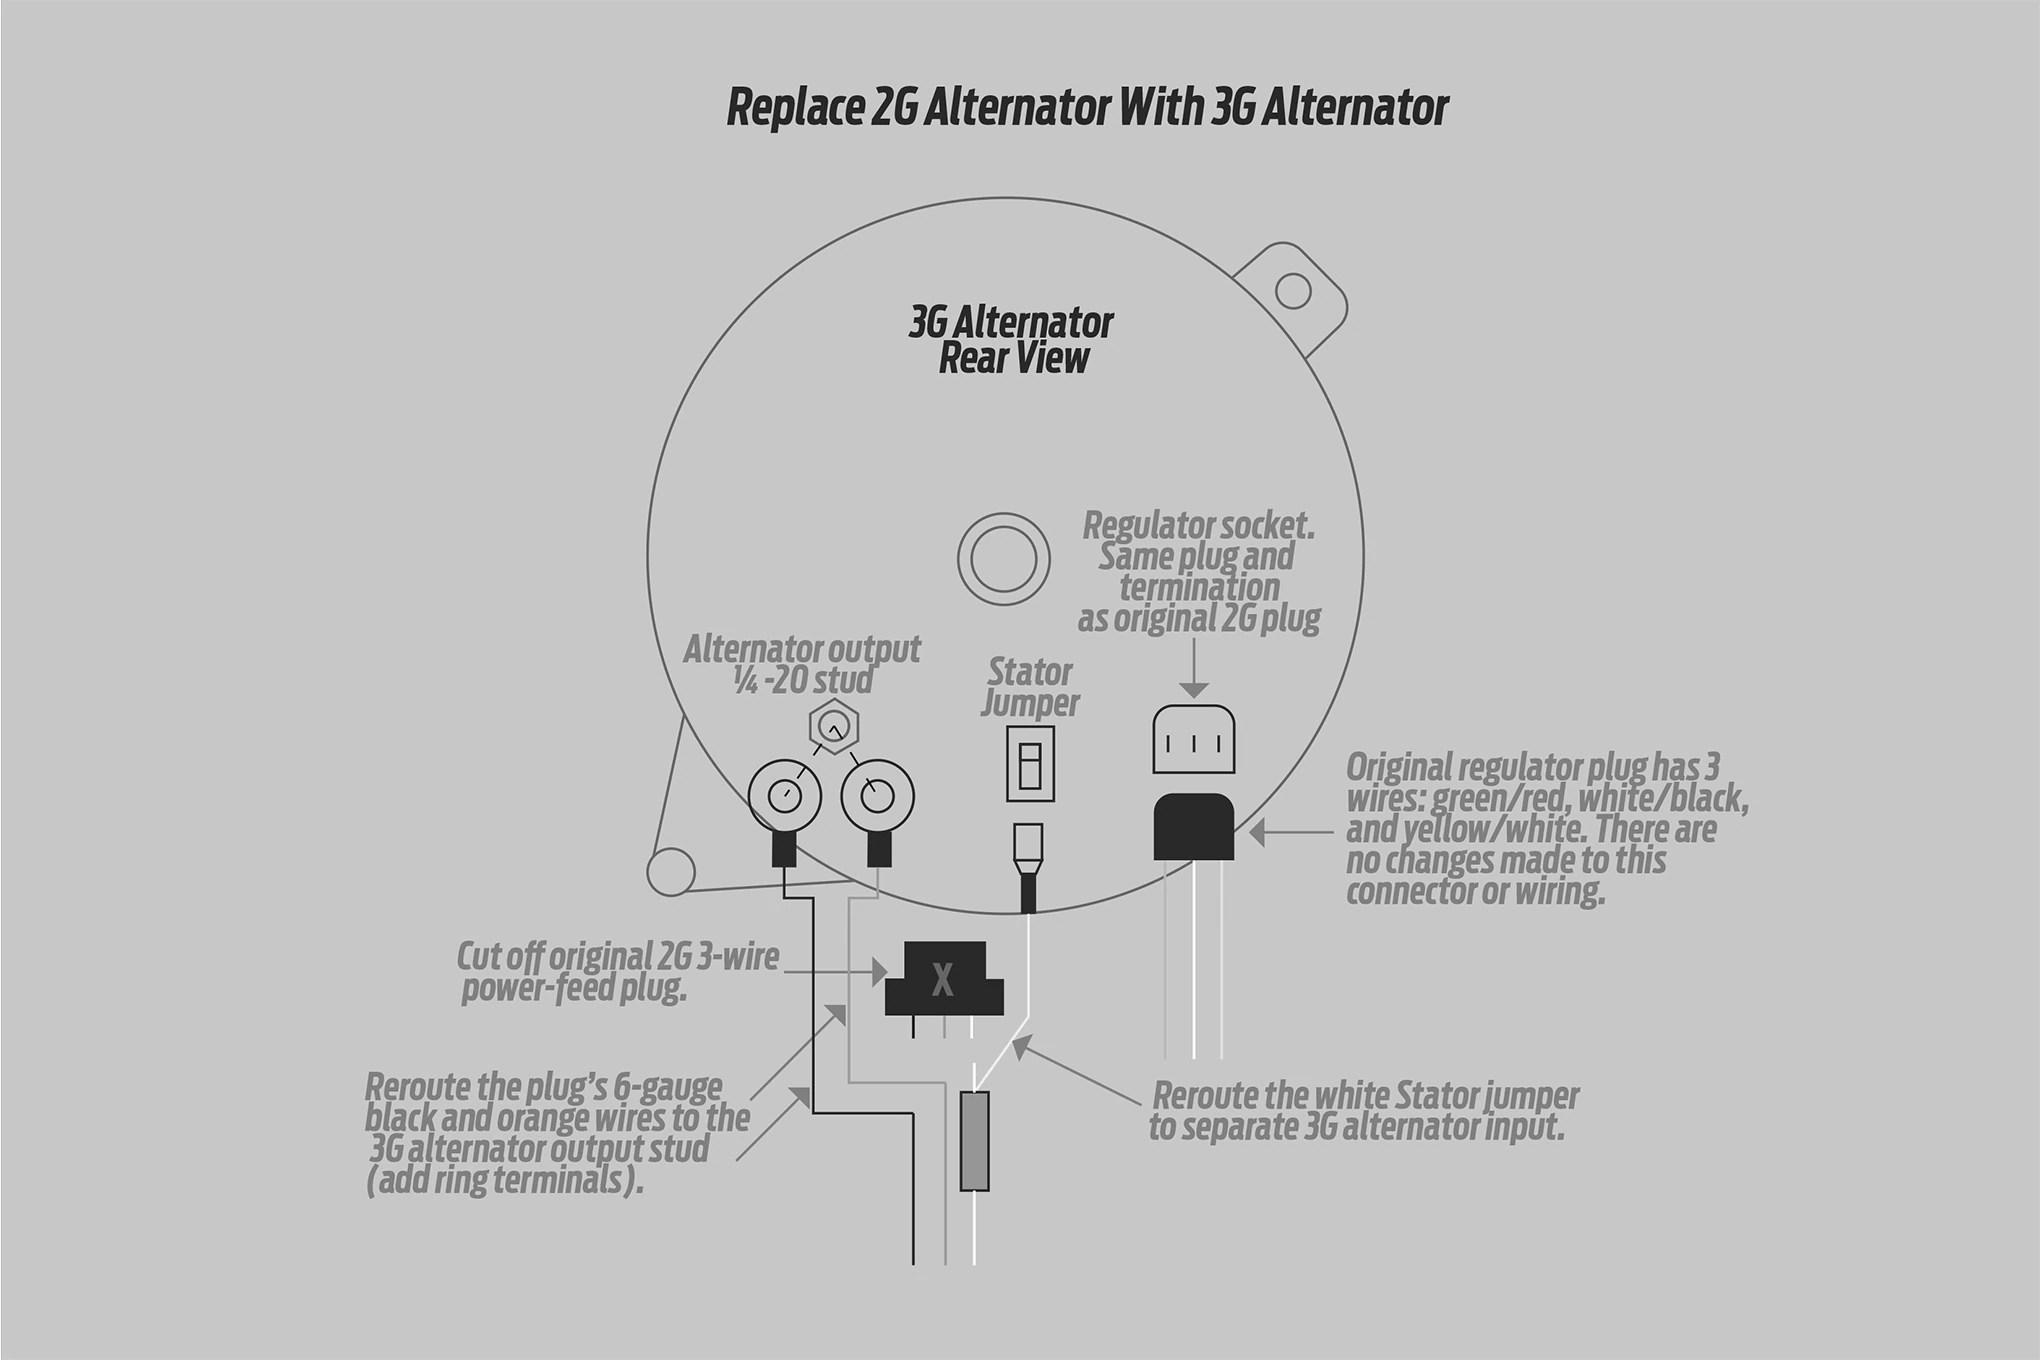 medium resolution of ron francis alternator wiring also ford 2g alternator wiring harness wiring diagram go